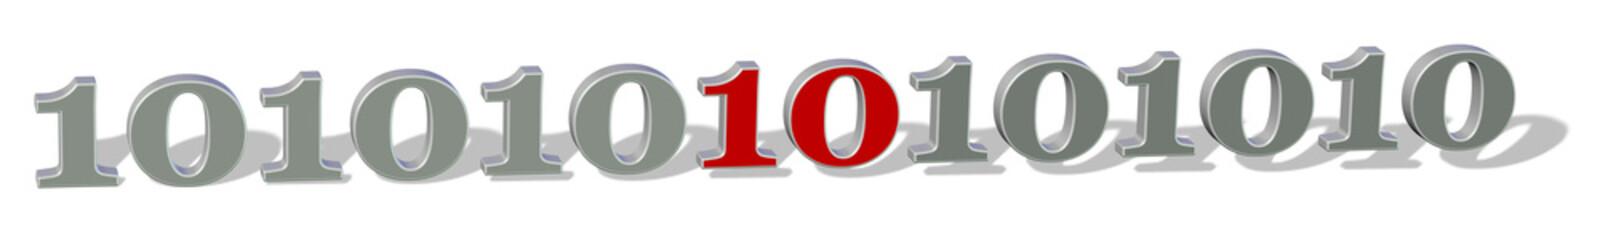 10 sayısı